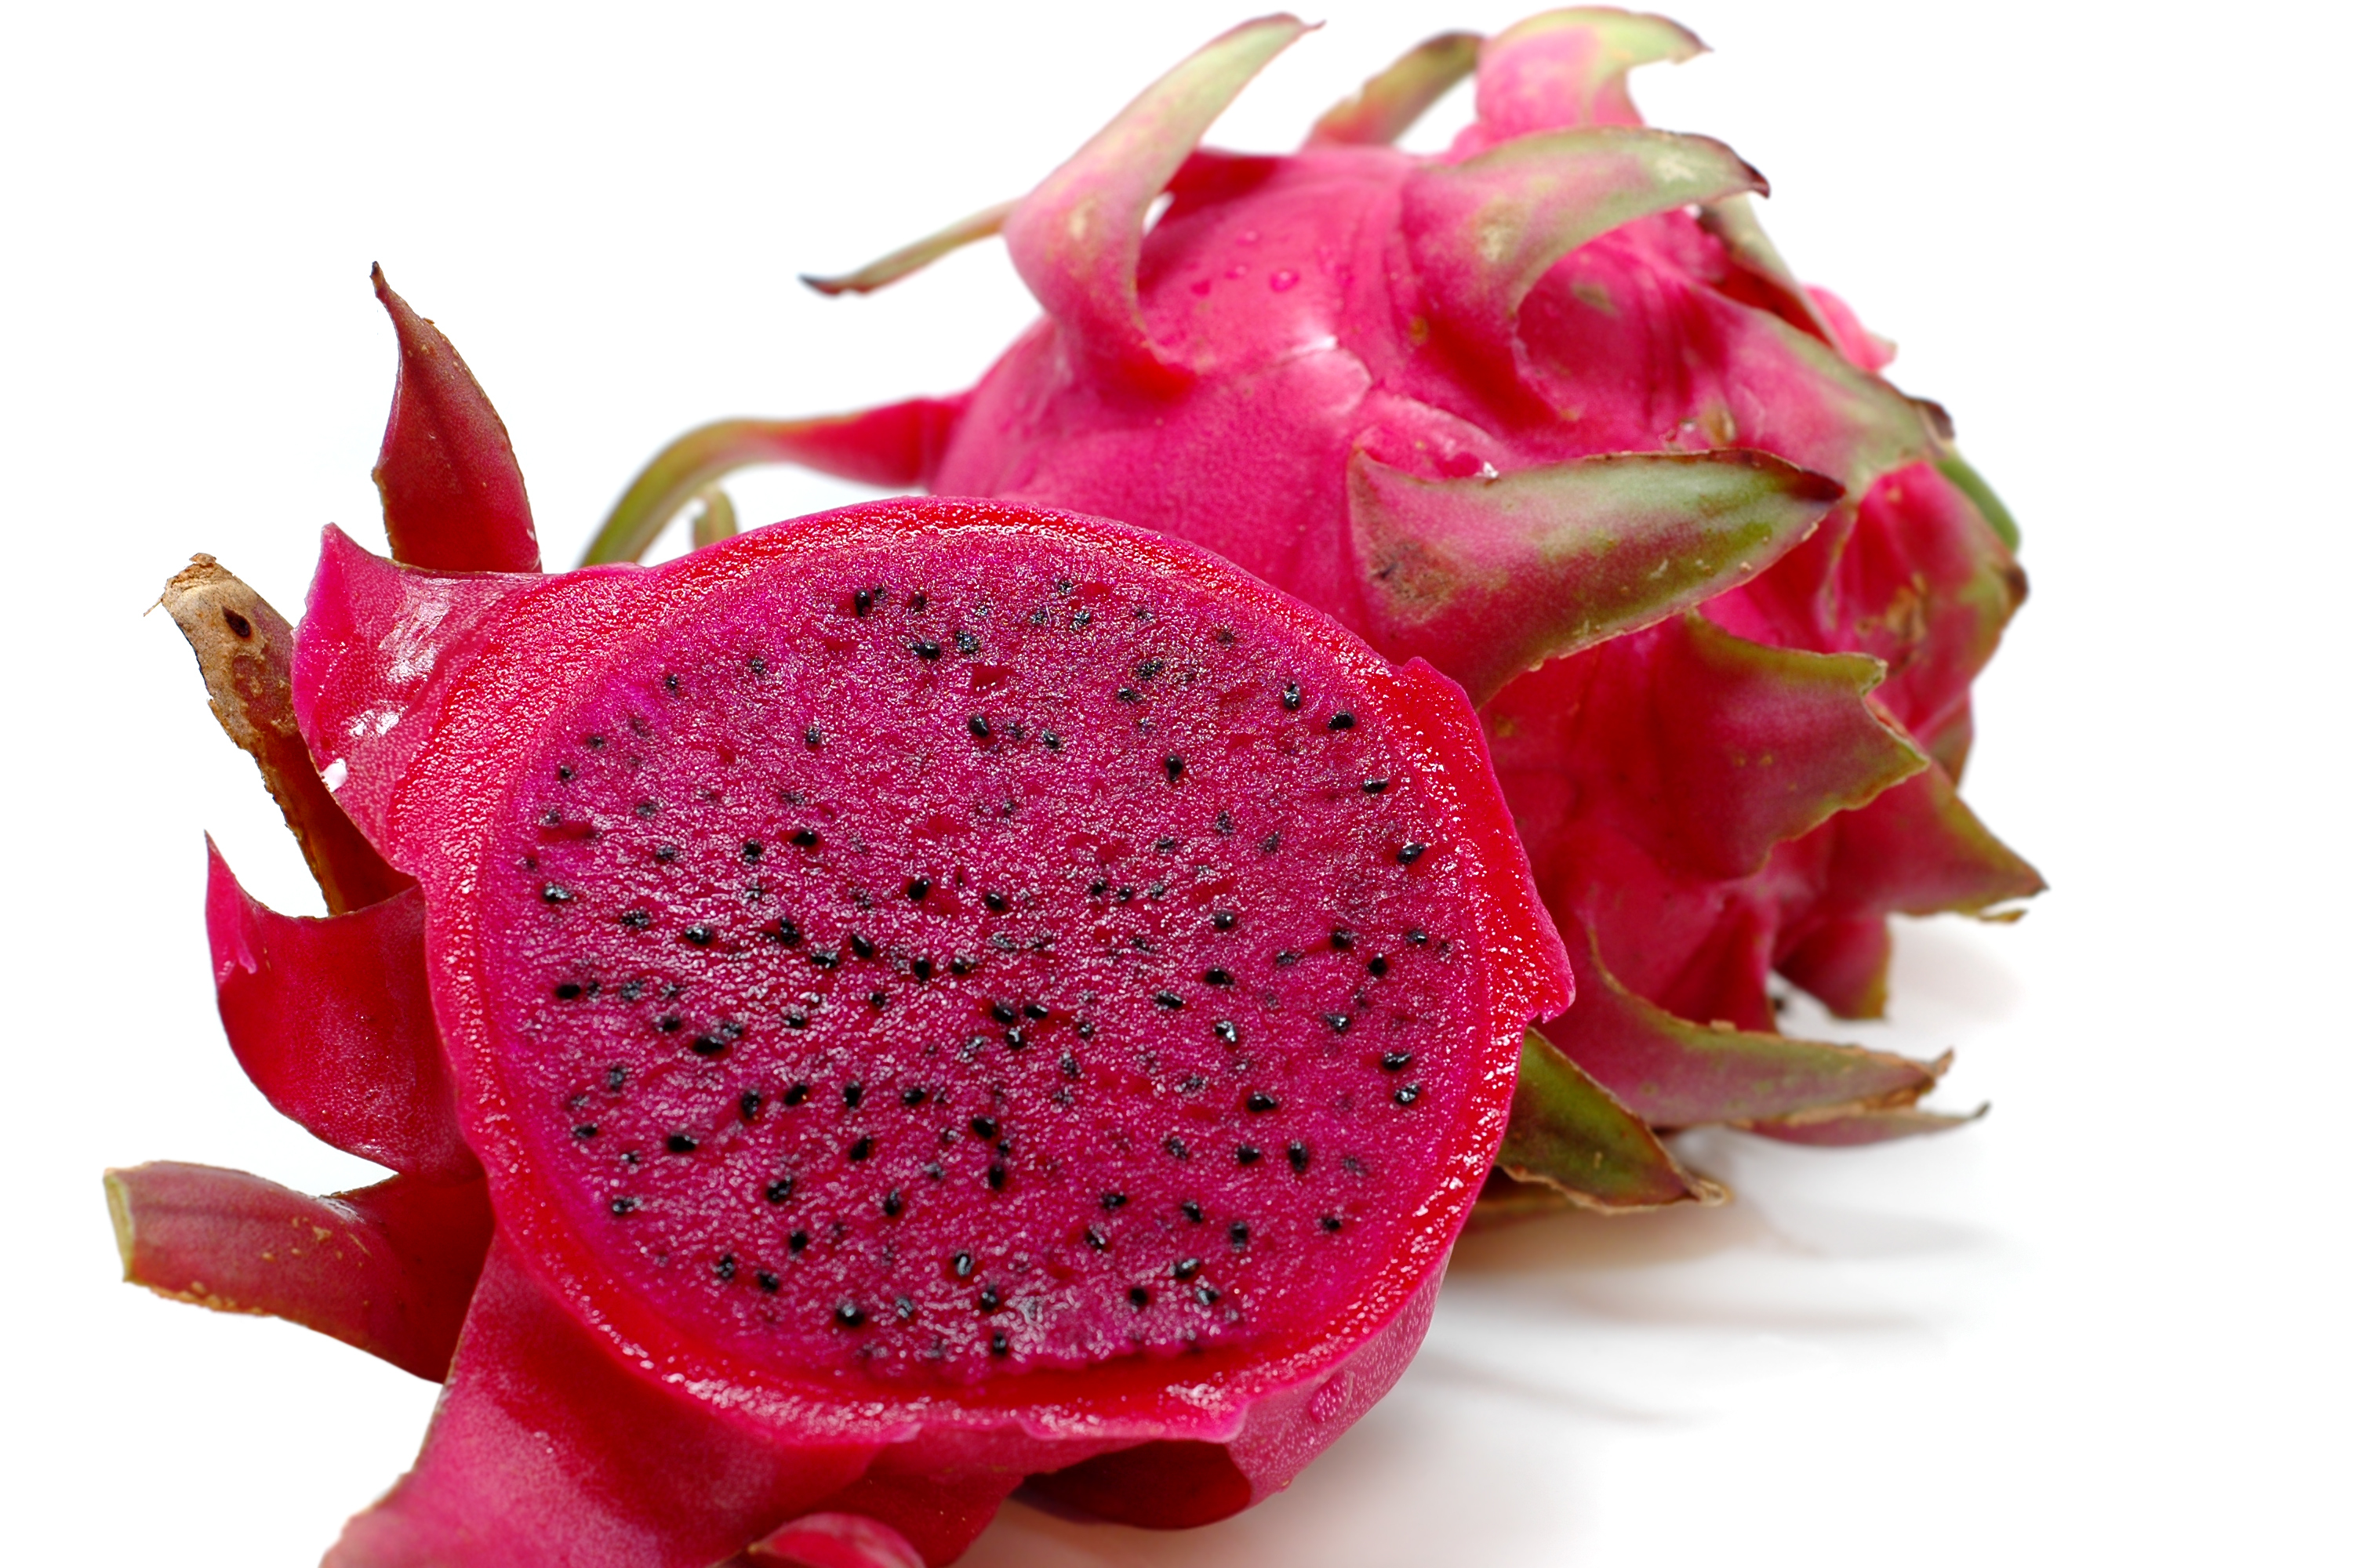 dragonfruit (red)